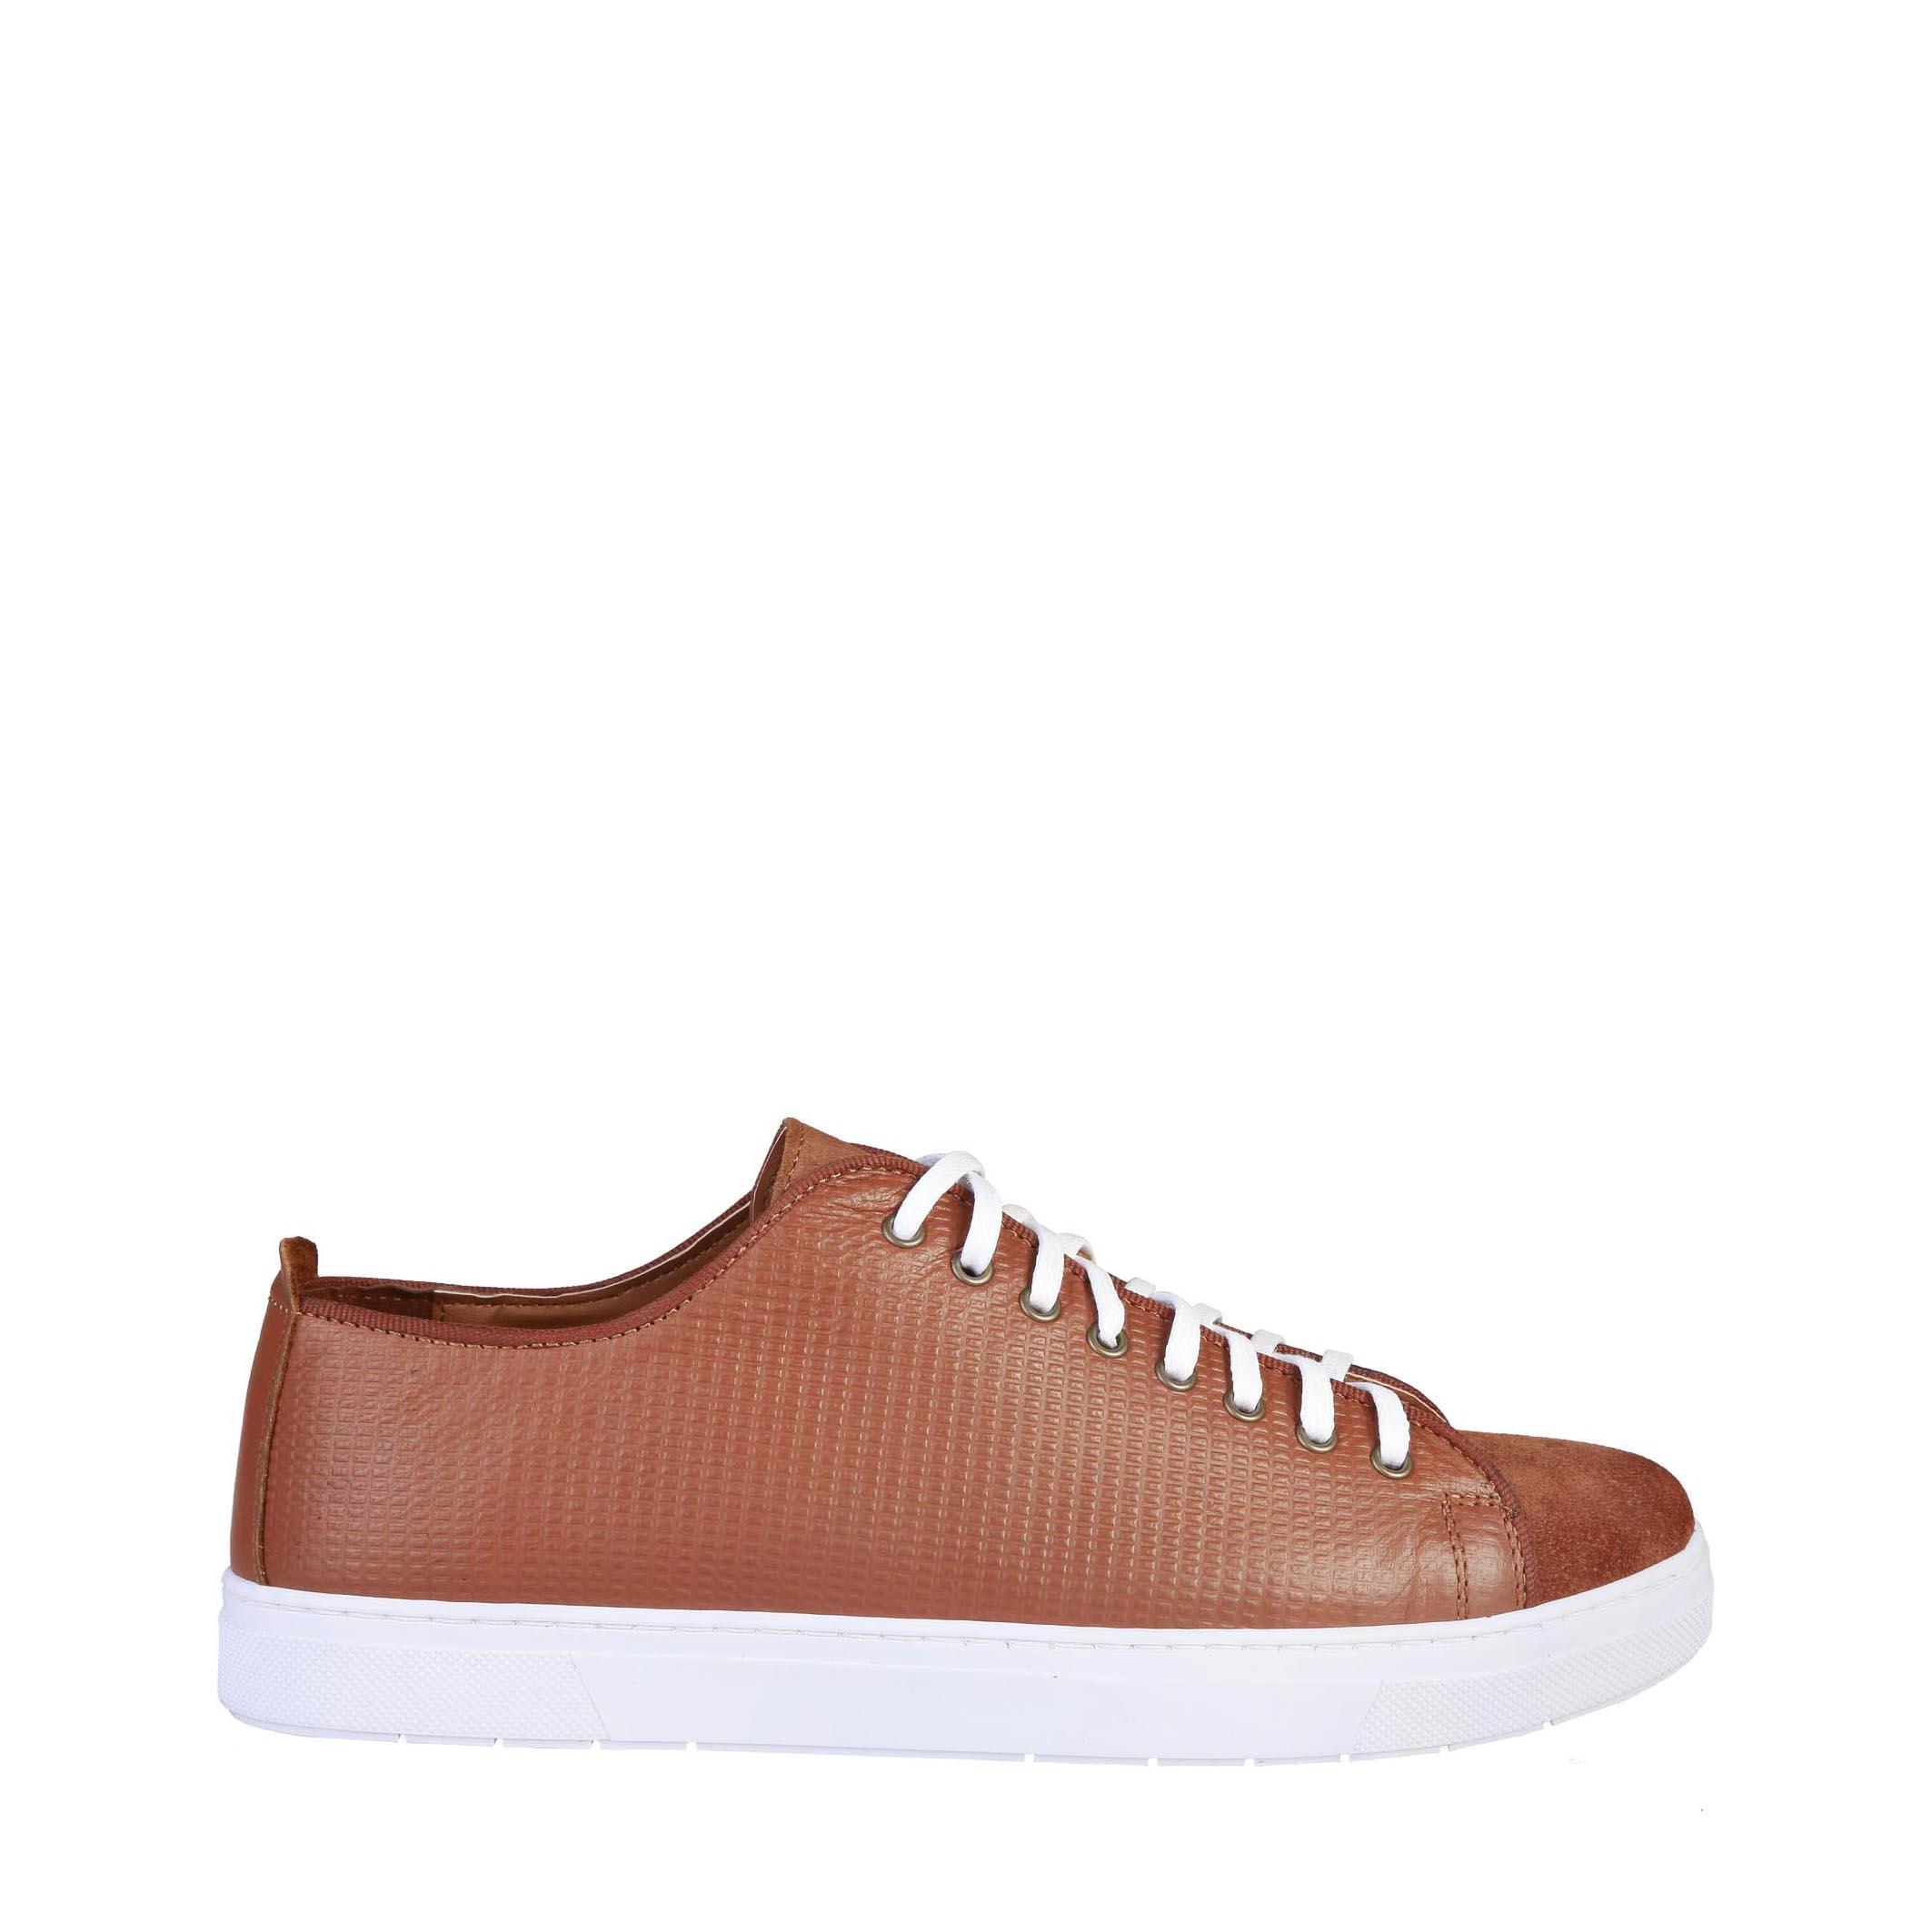 Sneakers-Pierre-Cardin-EDGARD-Uomo-Marrone-81933